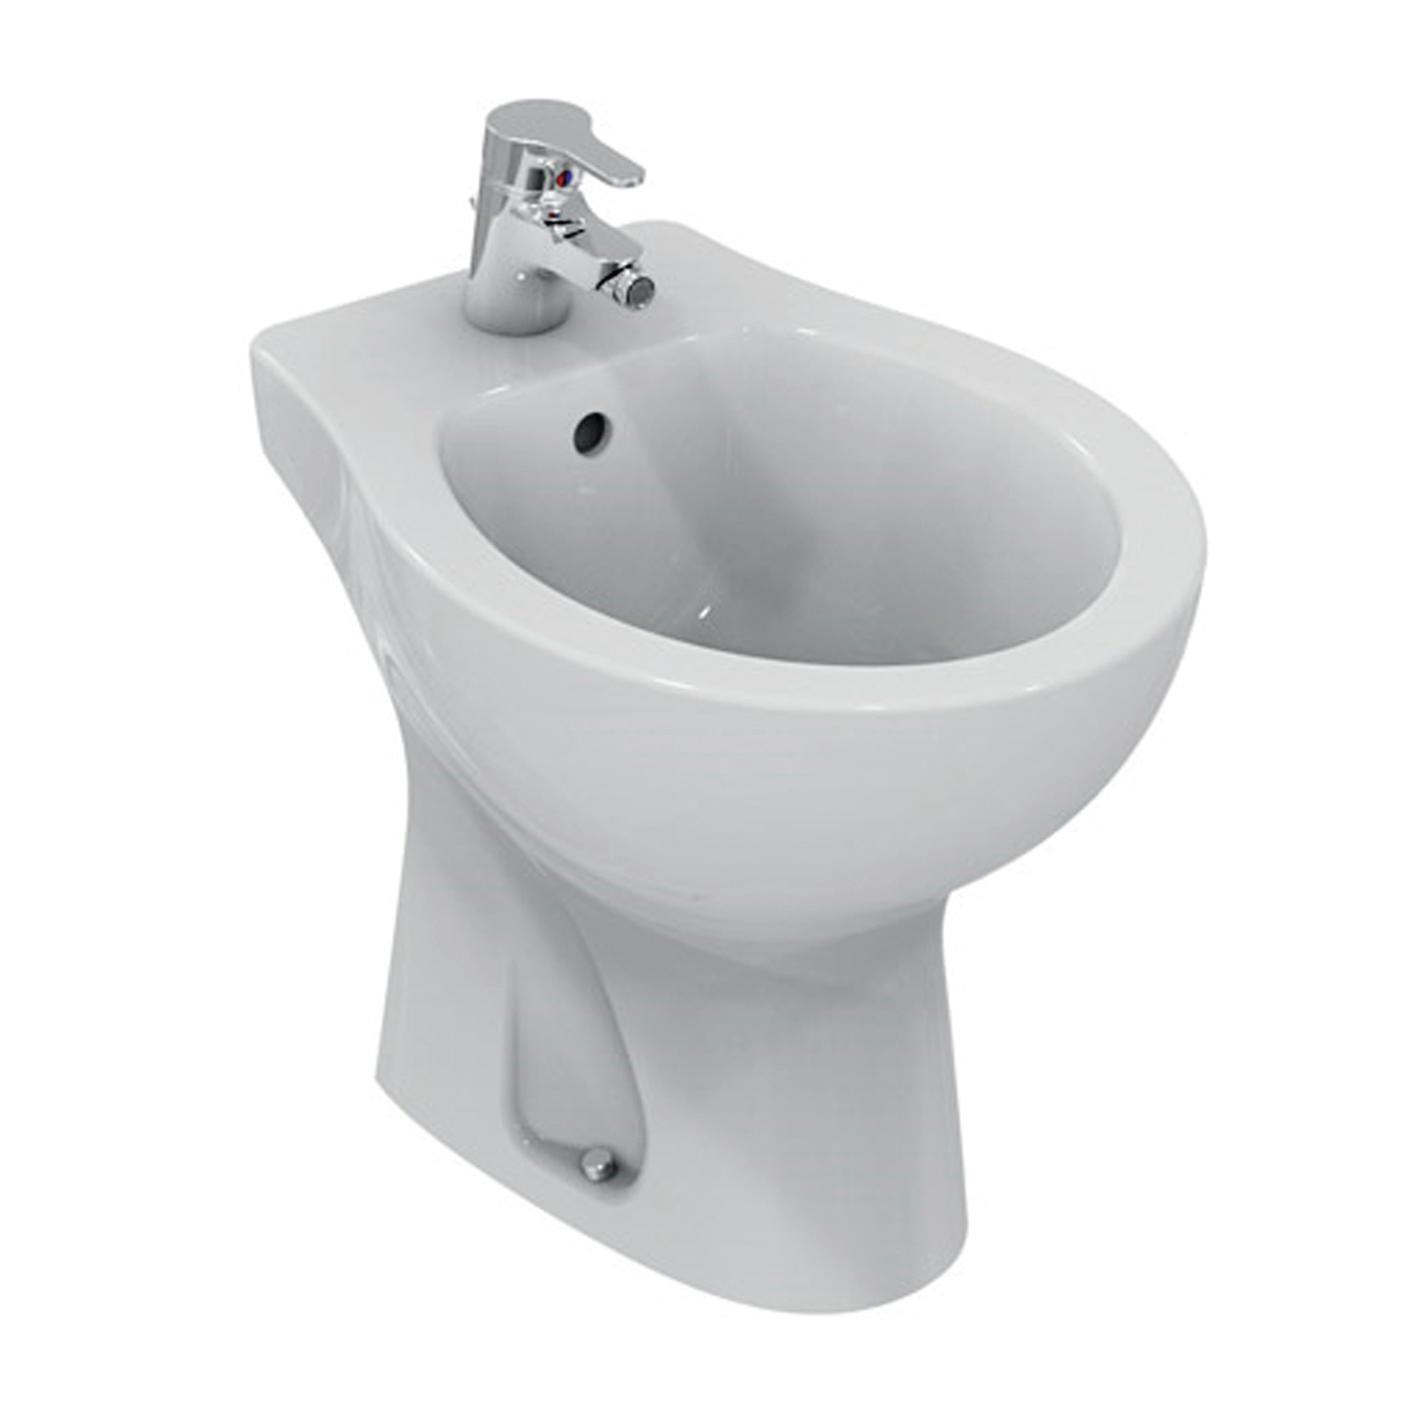 Coppia sanitari pavimento distanziato Miky New IDEAL STANDARD - 2